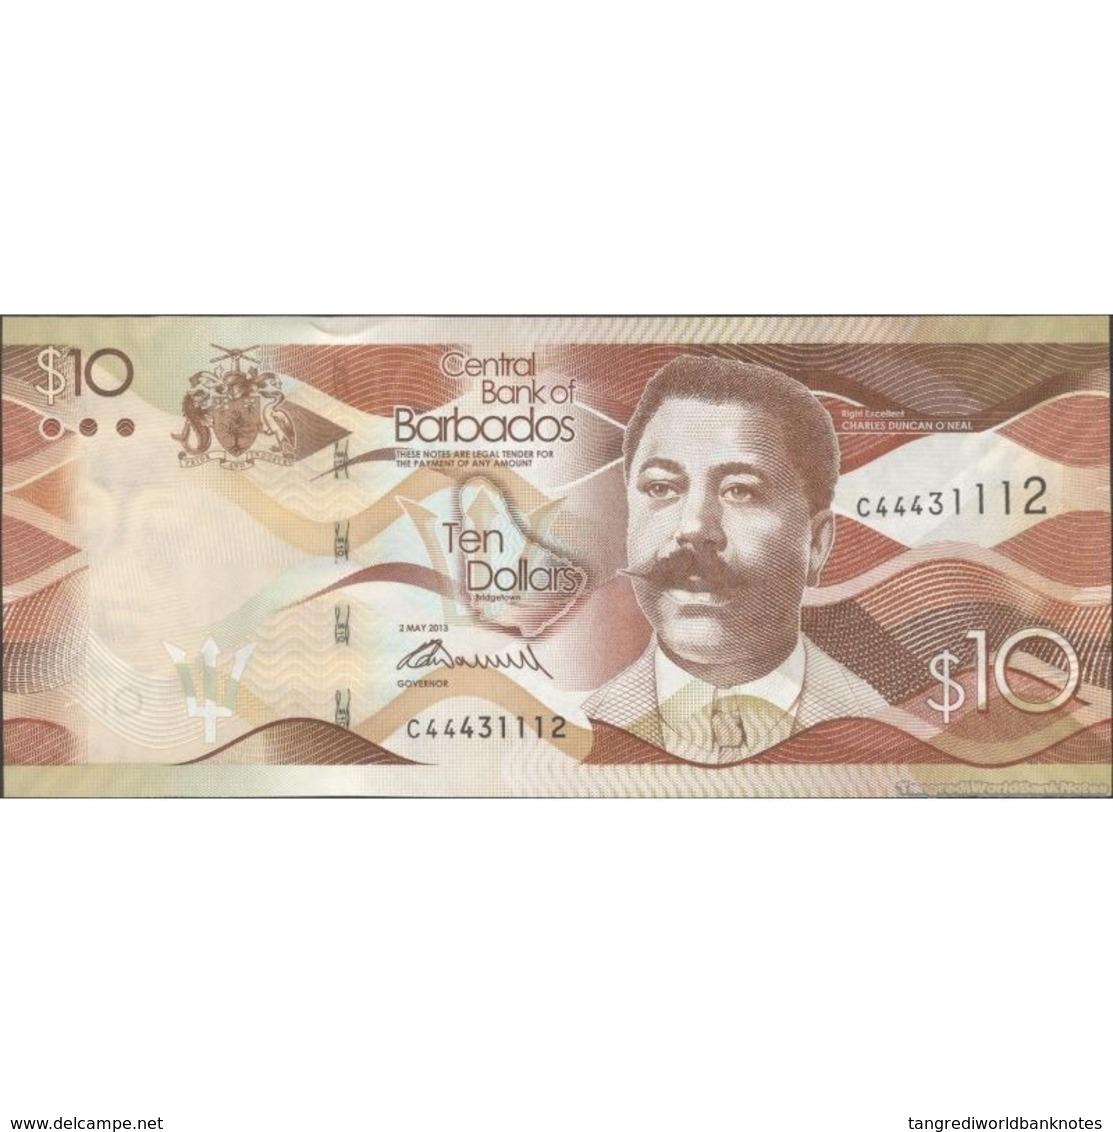 TWN - BARBADOS 75a - 10 Dollars 2.5.2013 Prefix C44 - Signature: Worrell UNC - Barbados